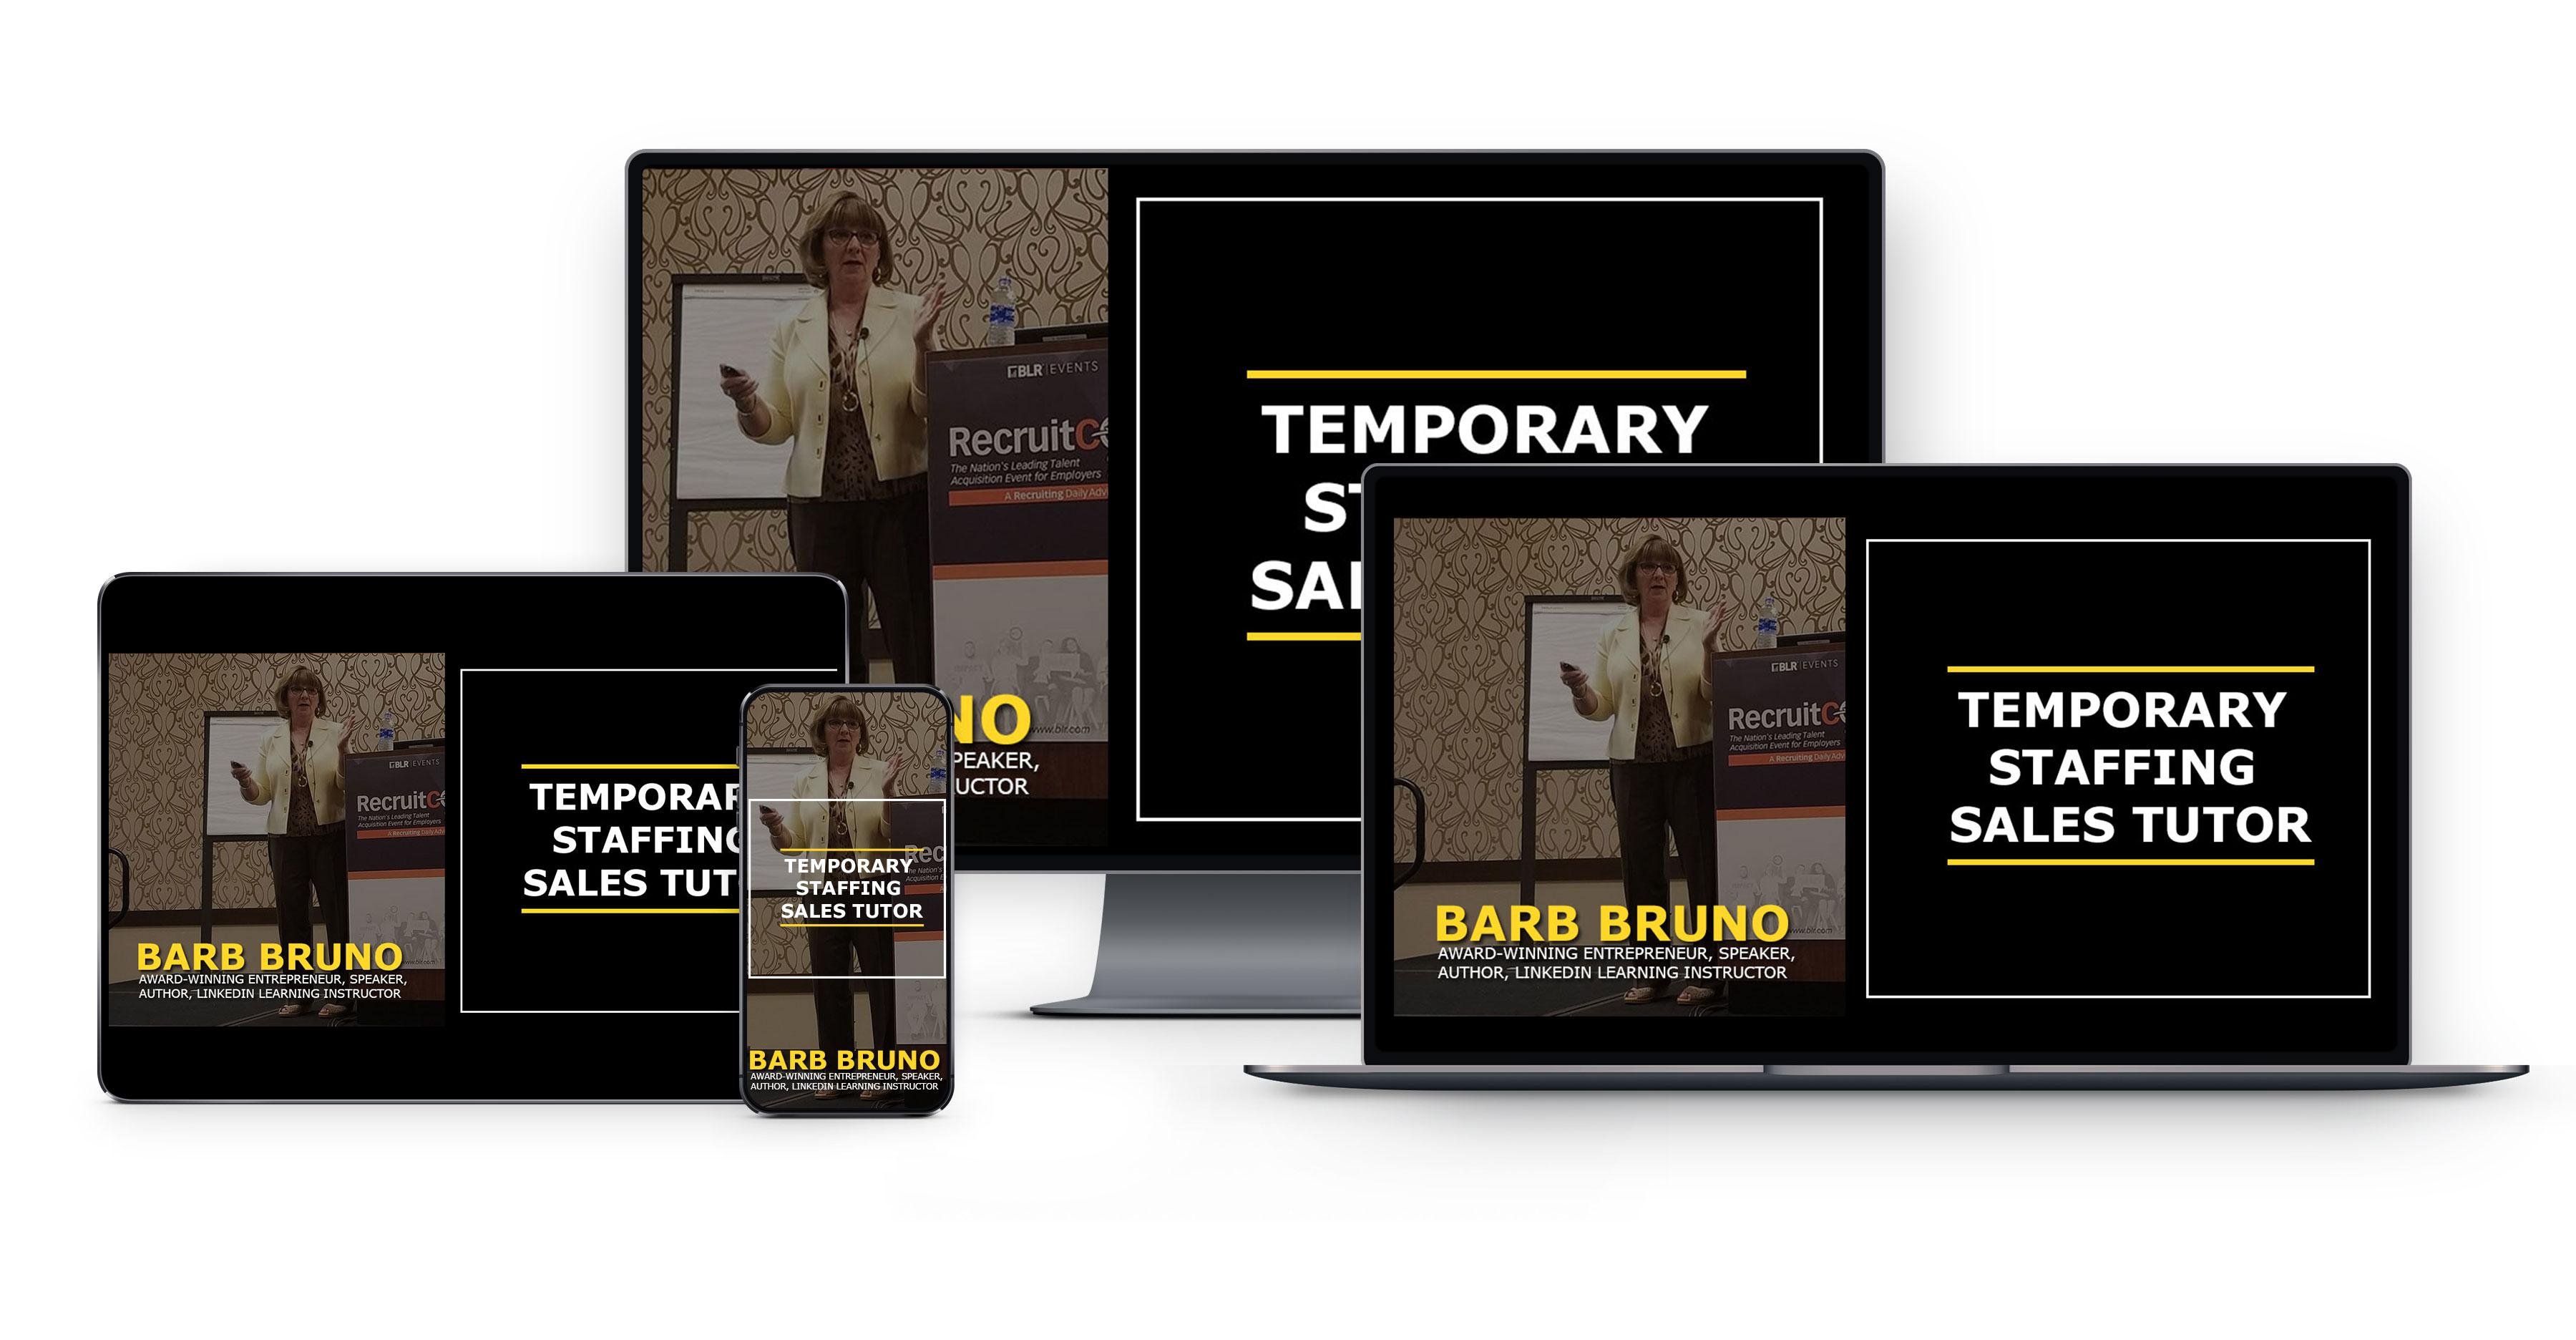 temporary-staffing-sales-tutor